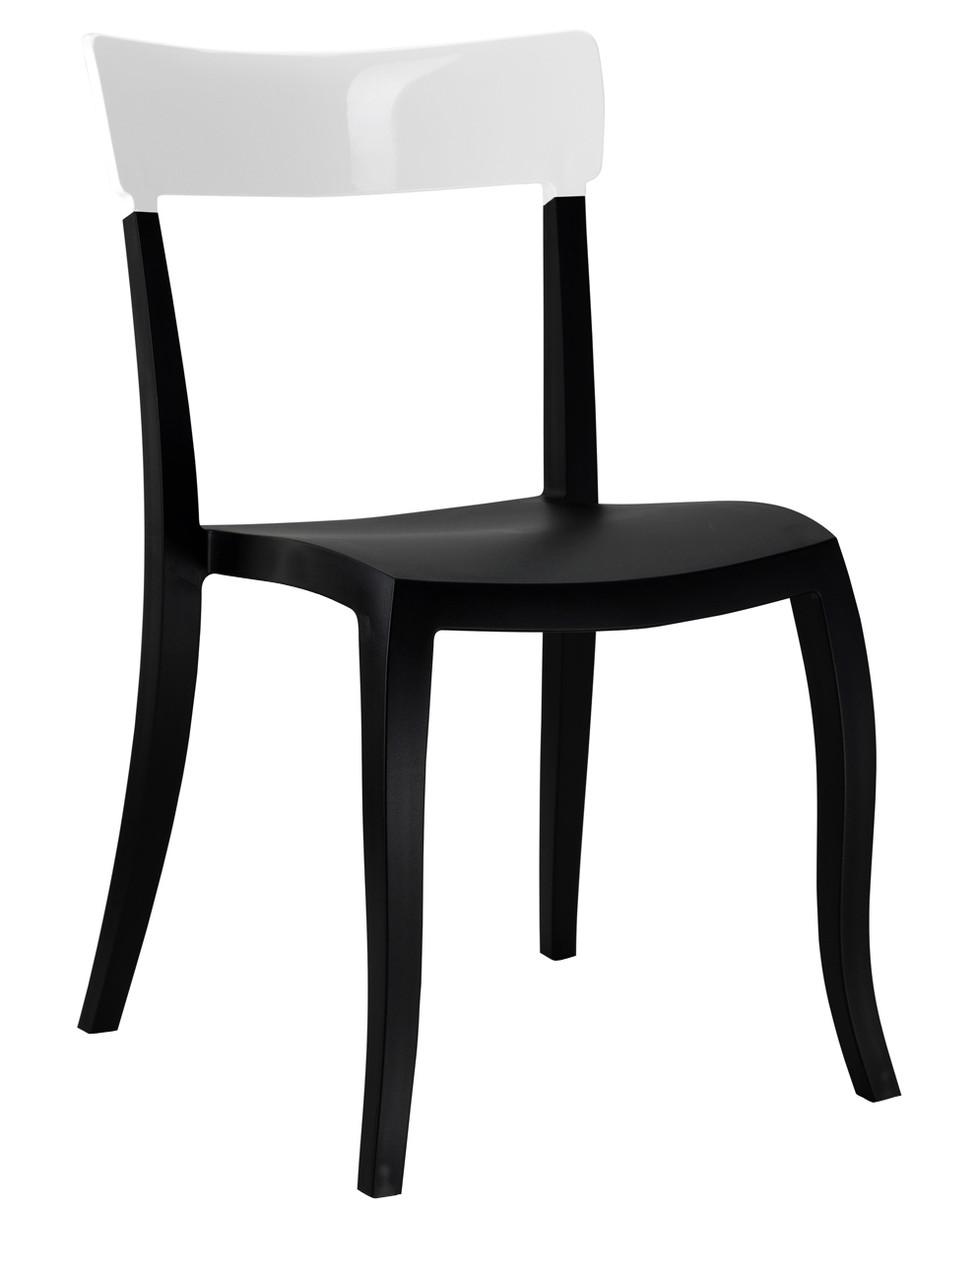 Стул Hera-S сиденье Черное верх Белый (Papatya-TM)